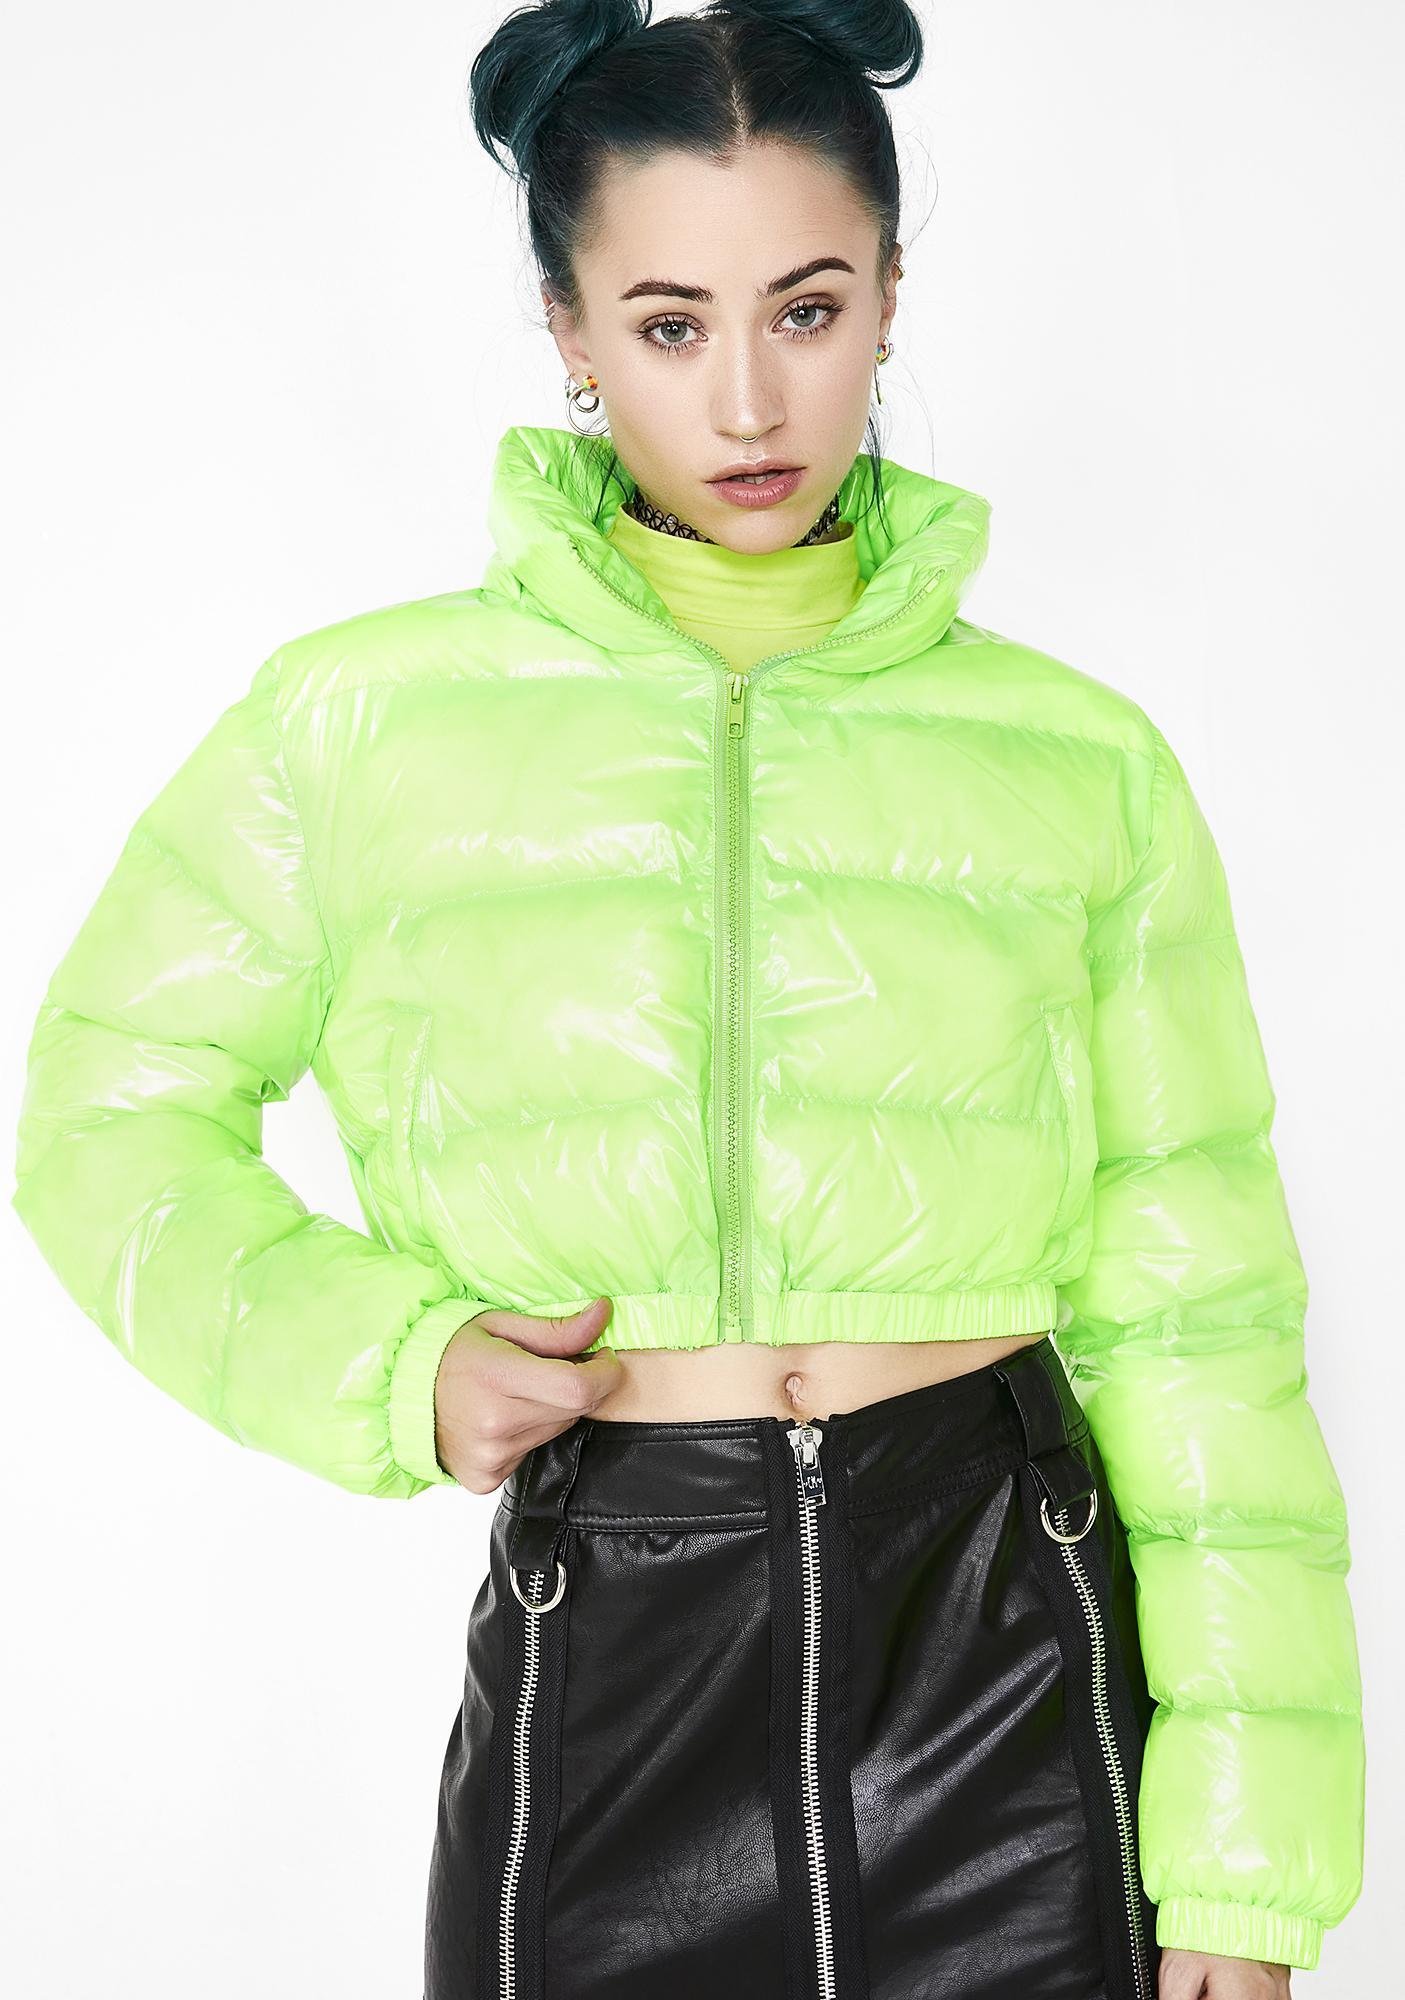 de562c0e02513b Current Mood Acid Limelight Puffer Jacket